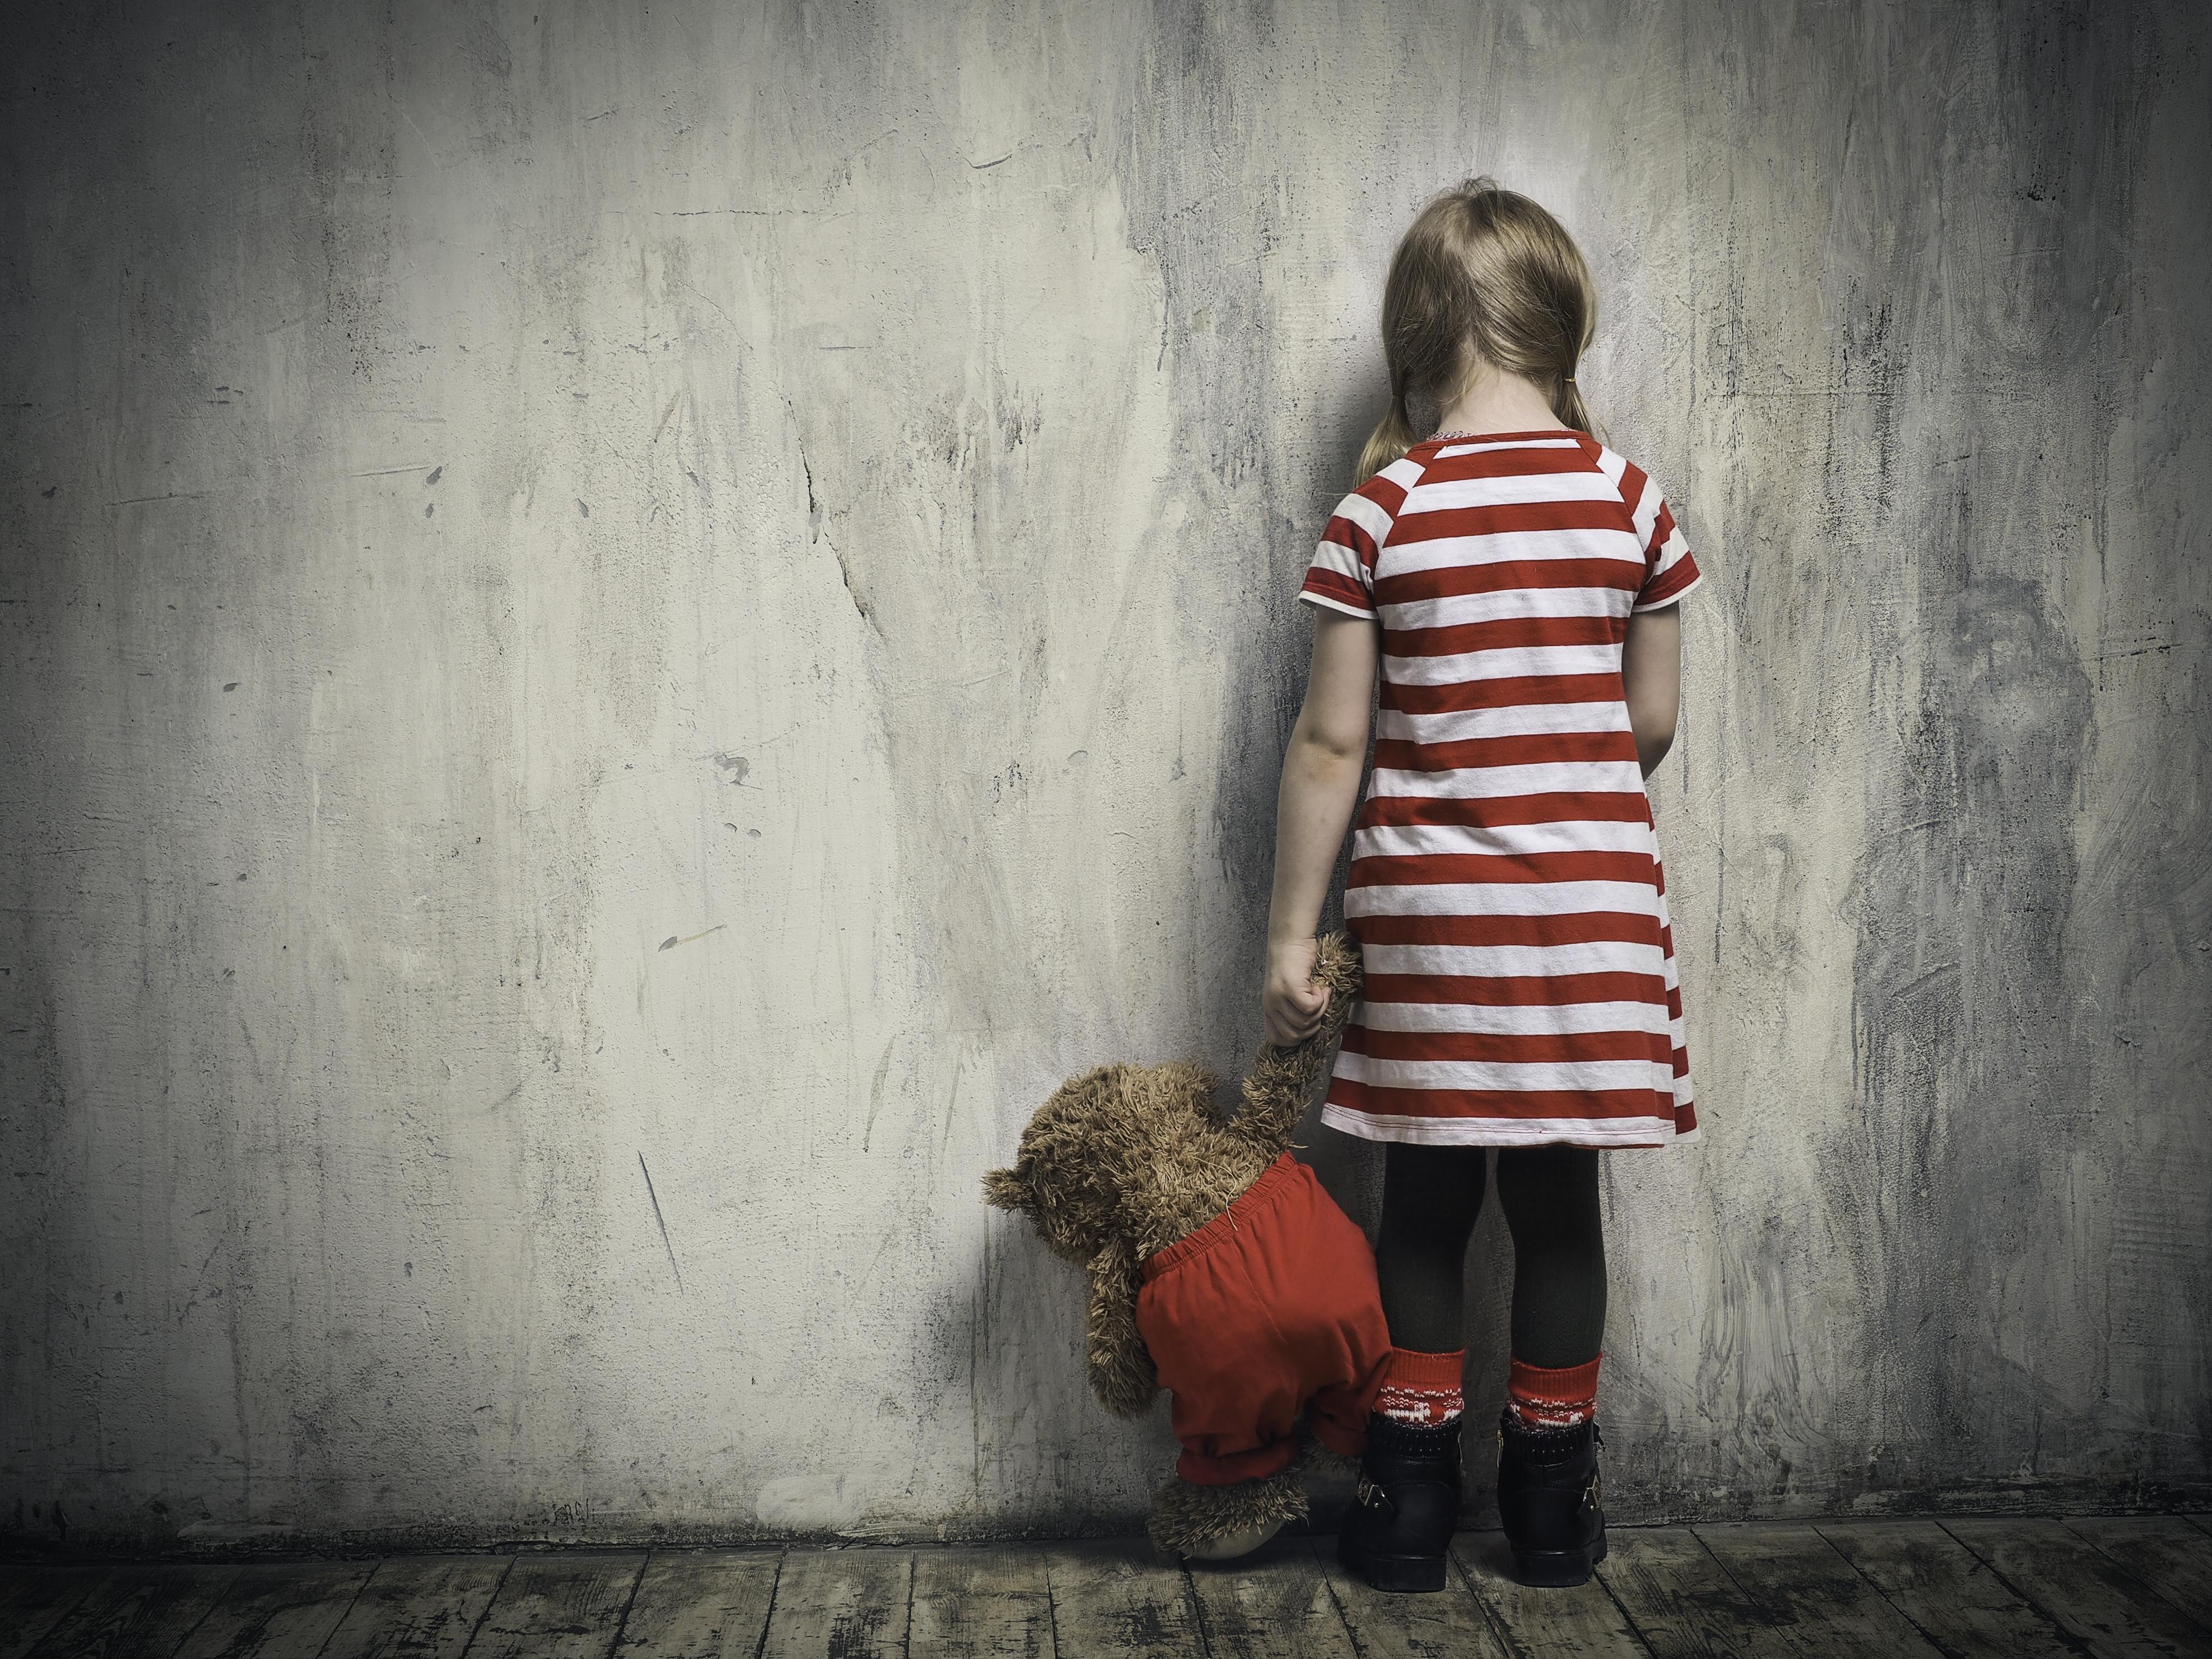 Pictured is a sad girl. SHUTTERSTOCK/ Irina Kozorog